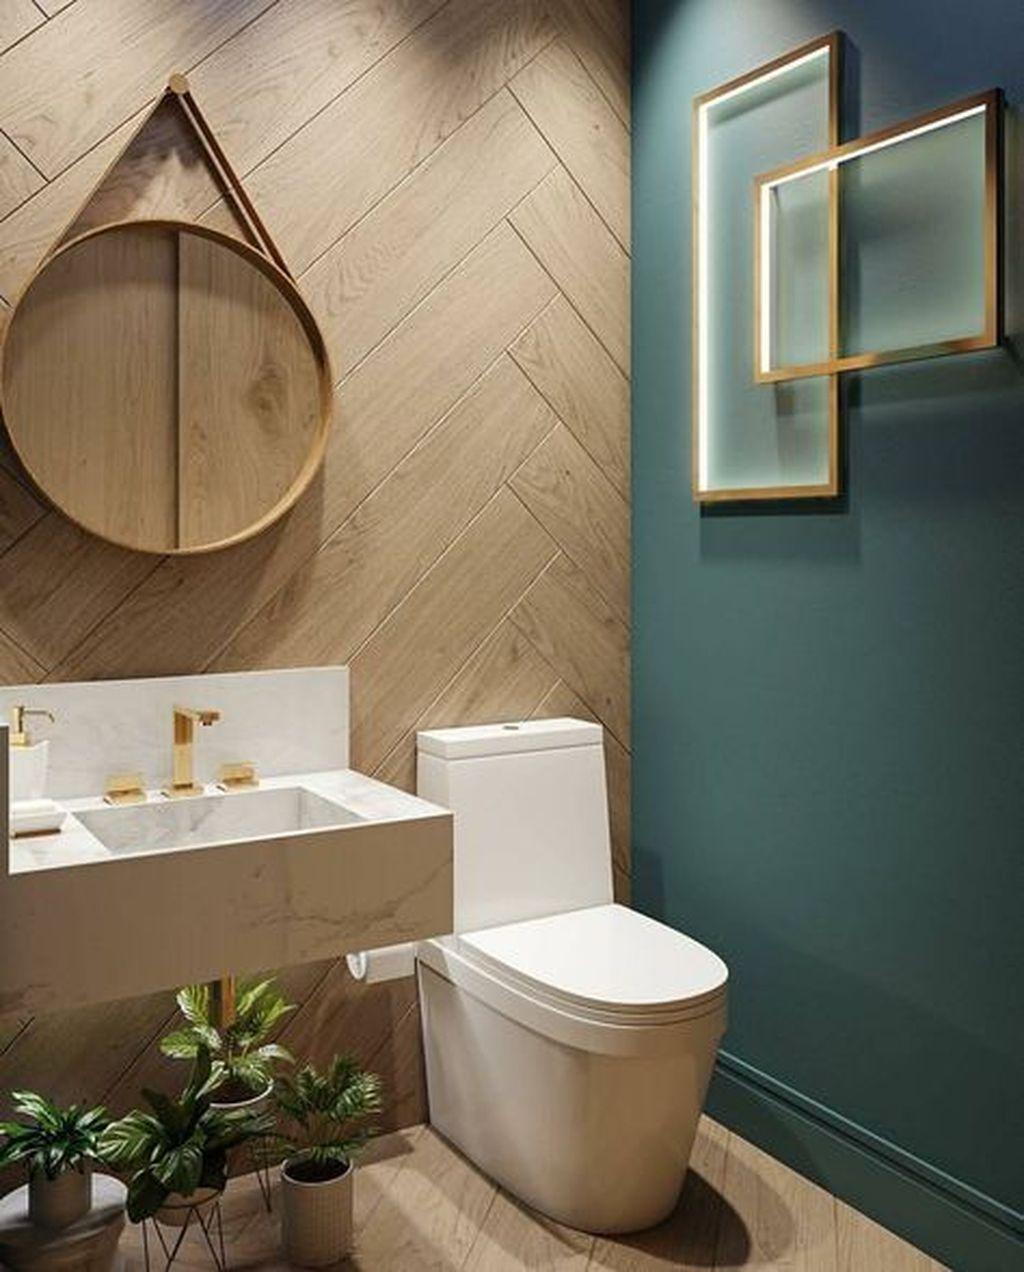 Unusual Bathroom Design Ideas You Need To Know 08